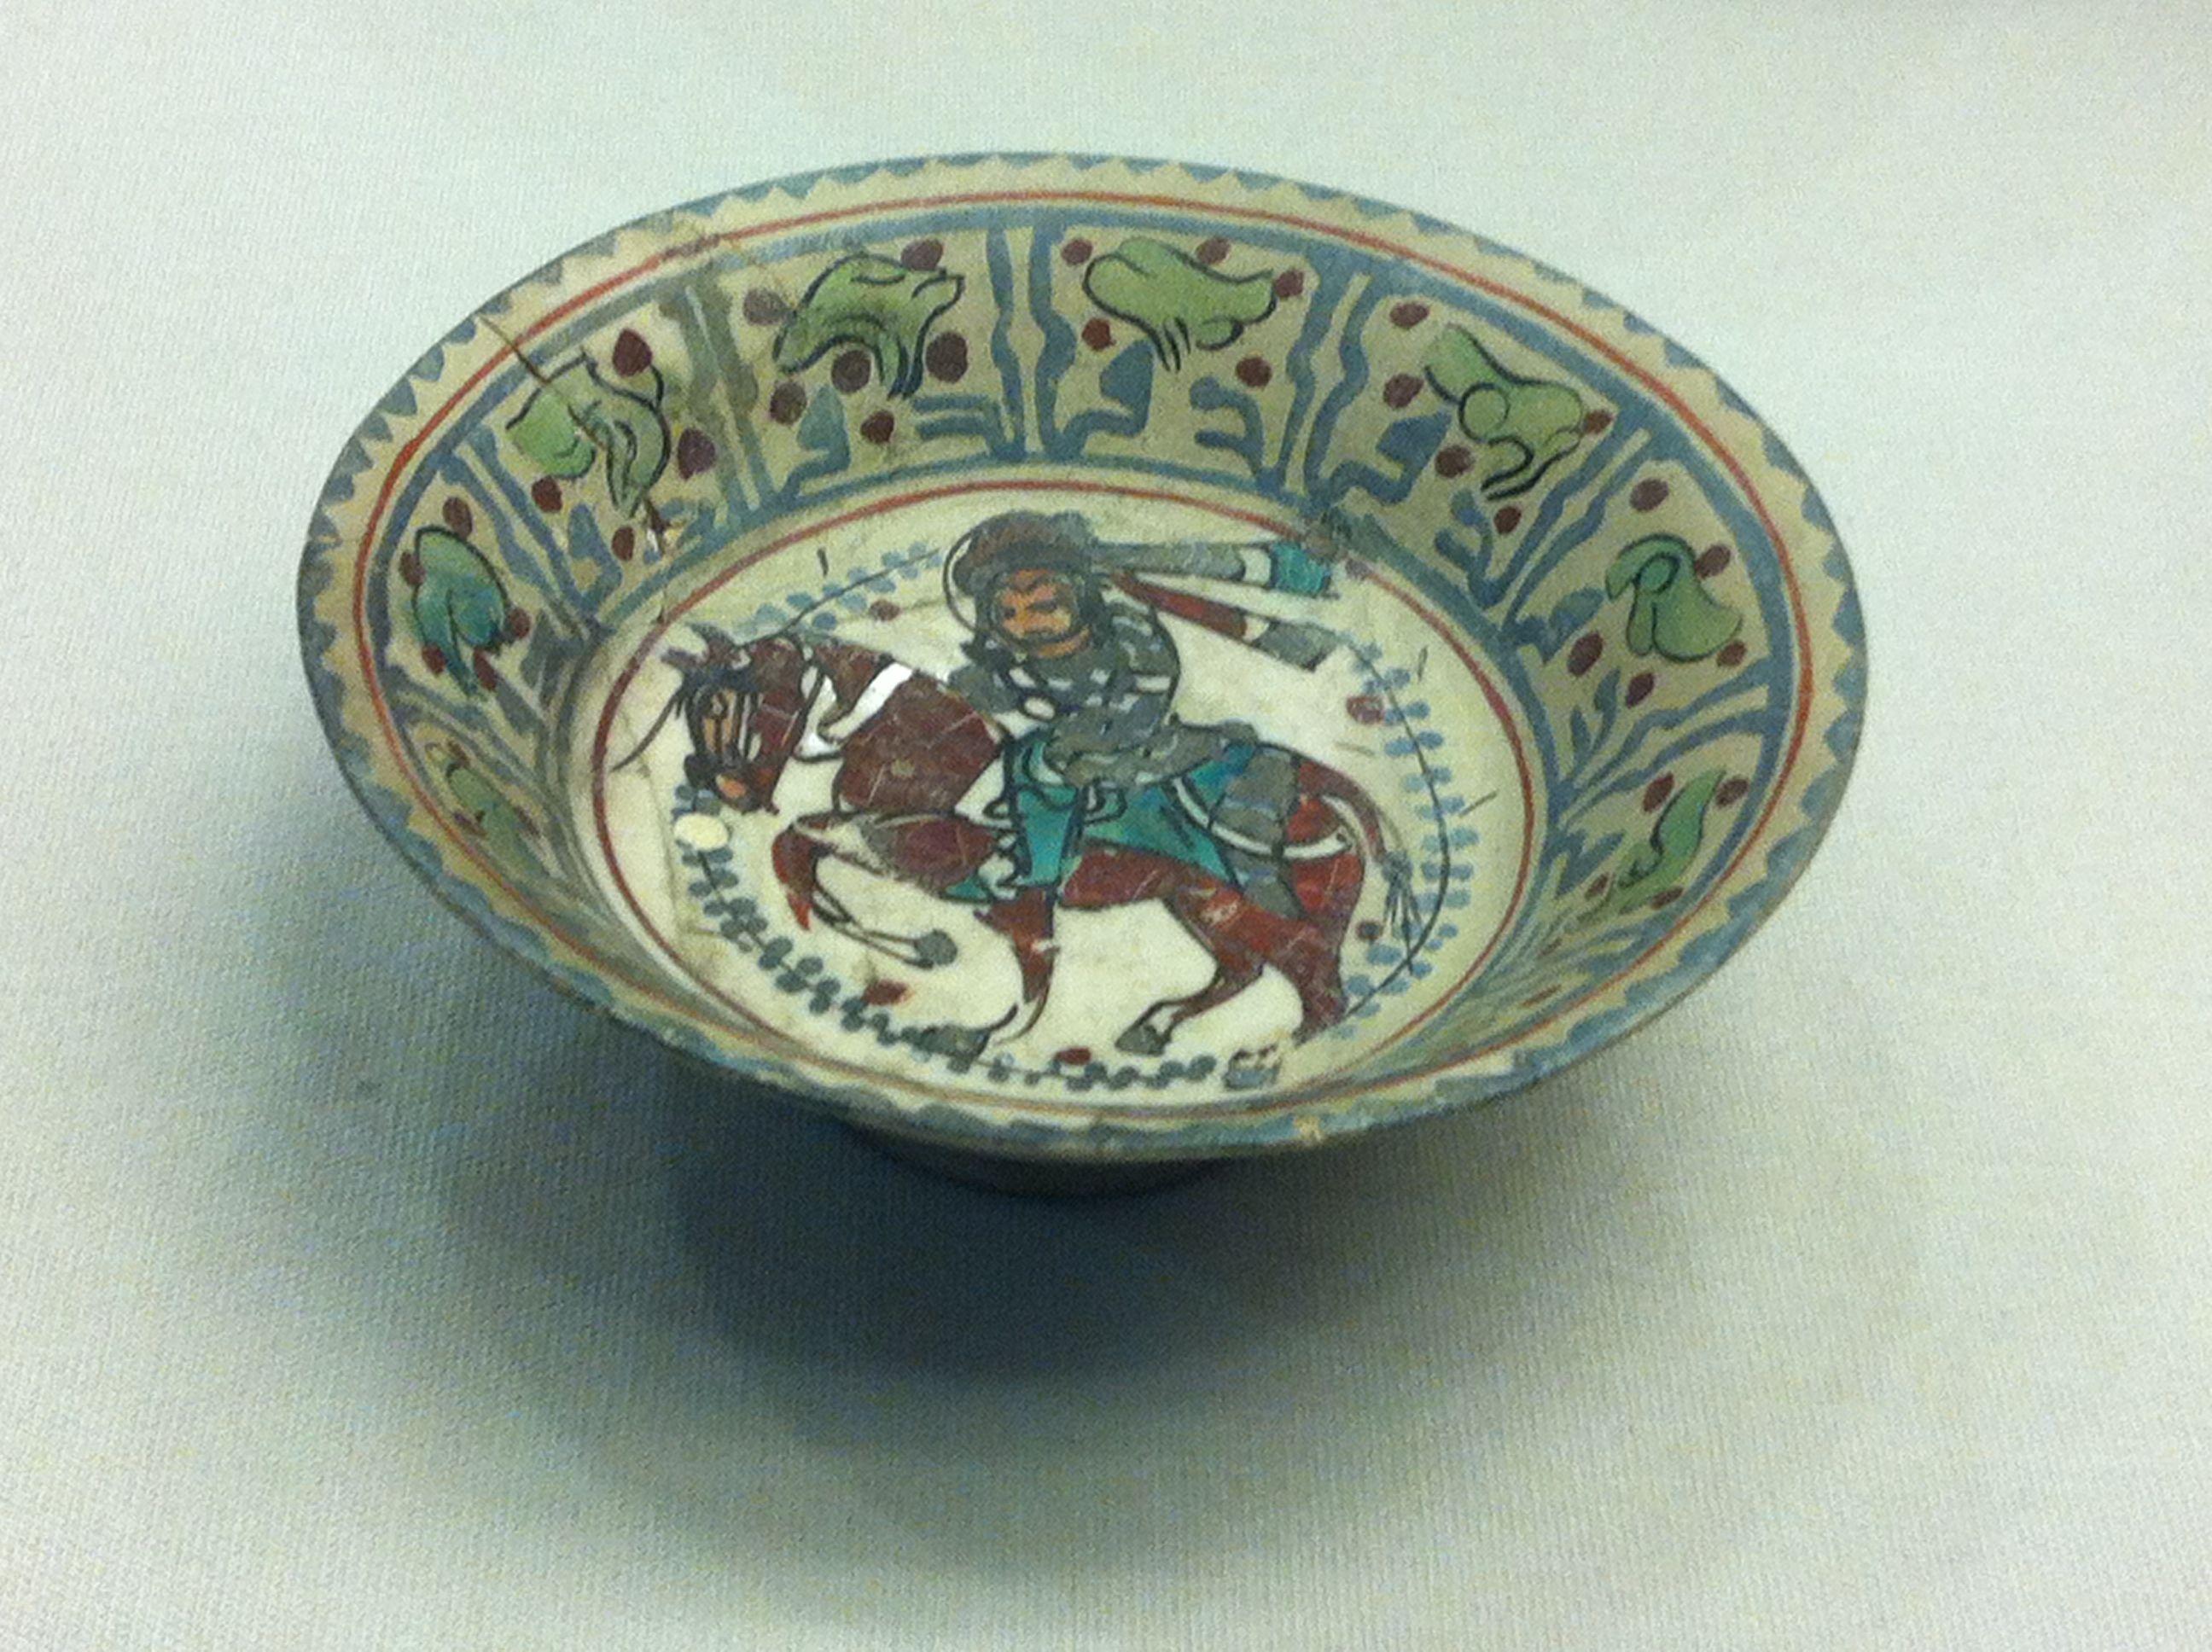 Stone-paste bowl, decorated in the 'minai' technique. C12th-C13th, Kashan, Iran.